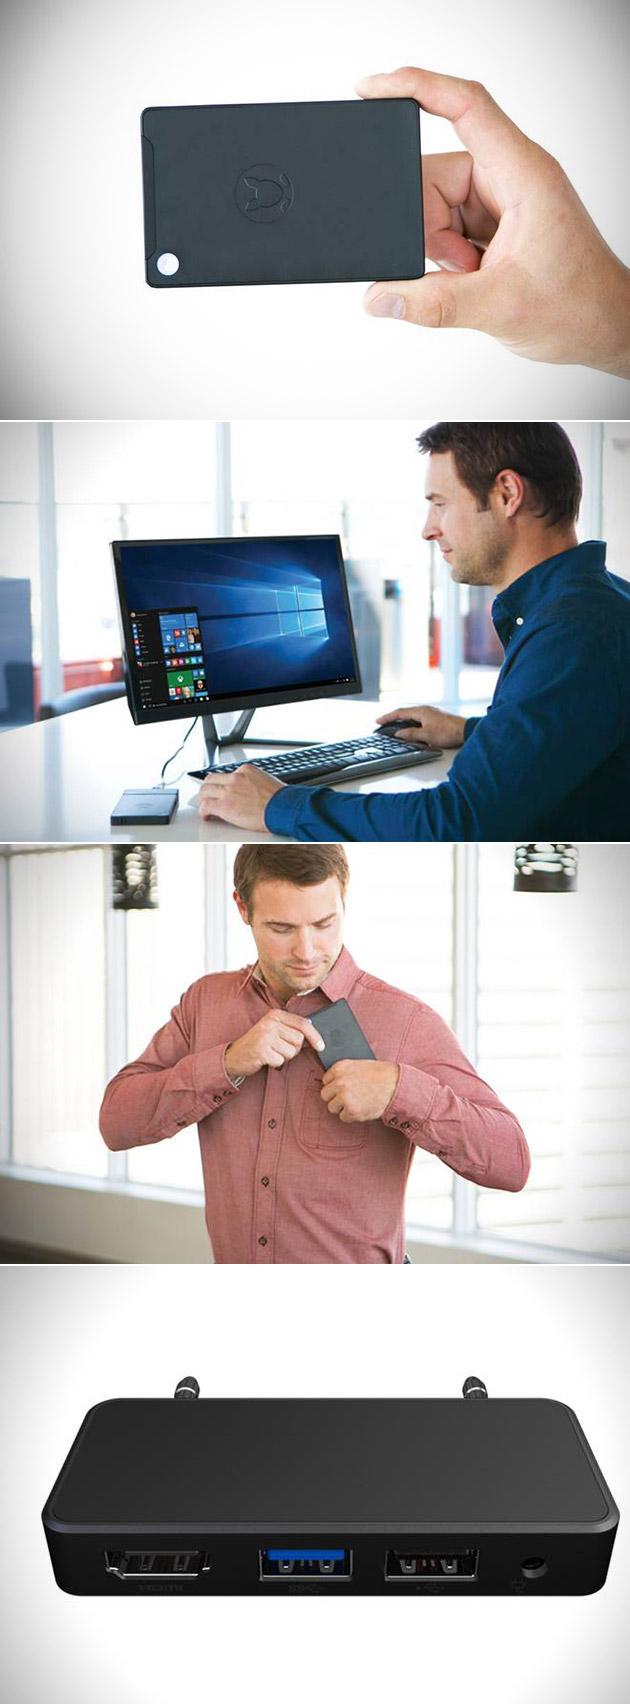 Kangaroo PC Windows 10